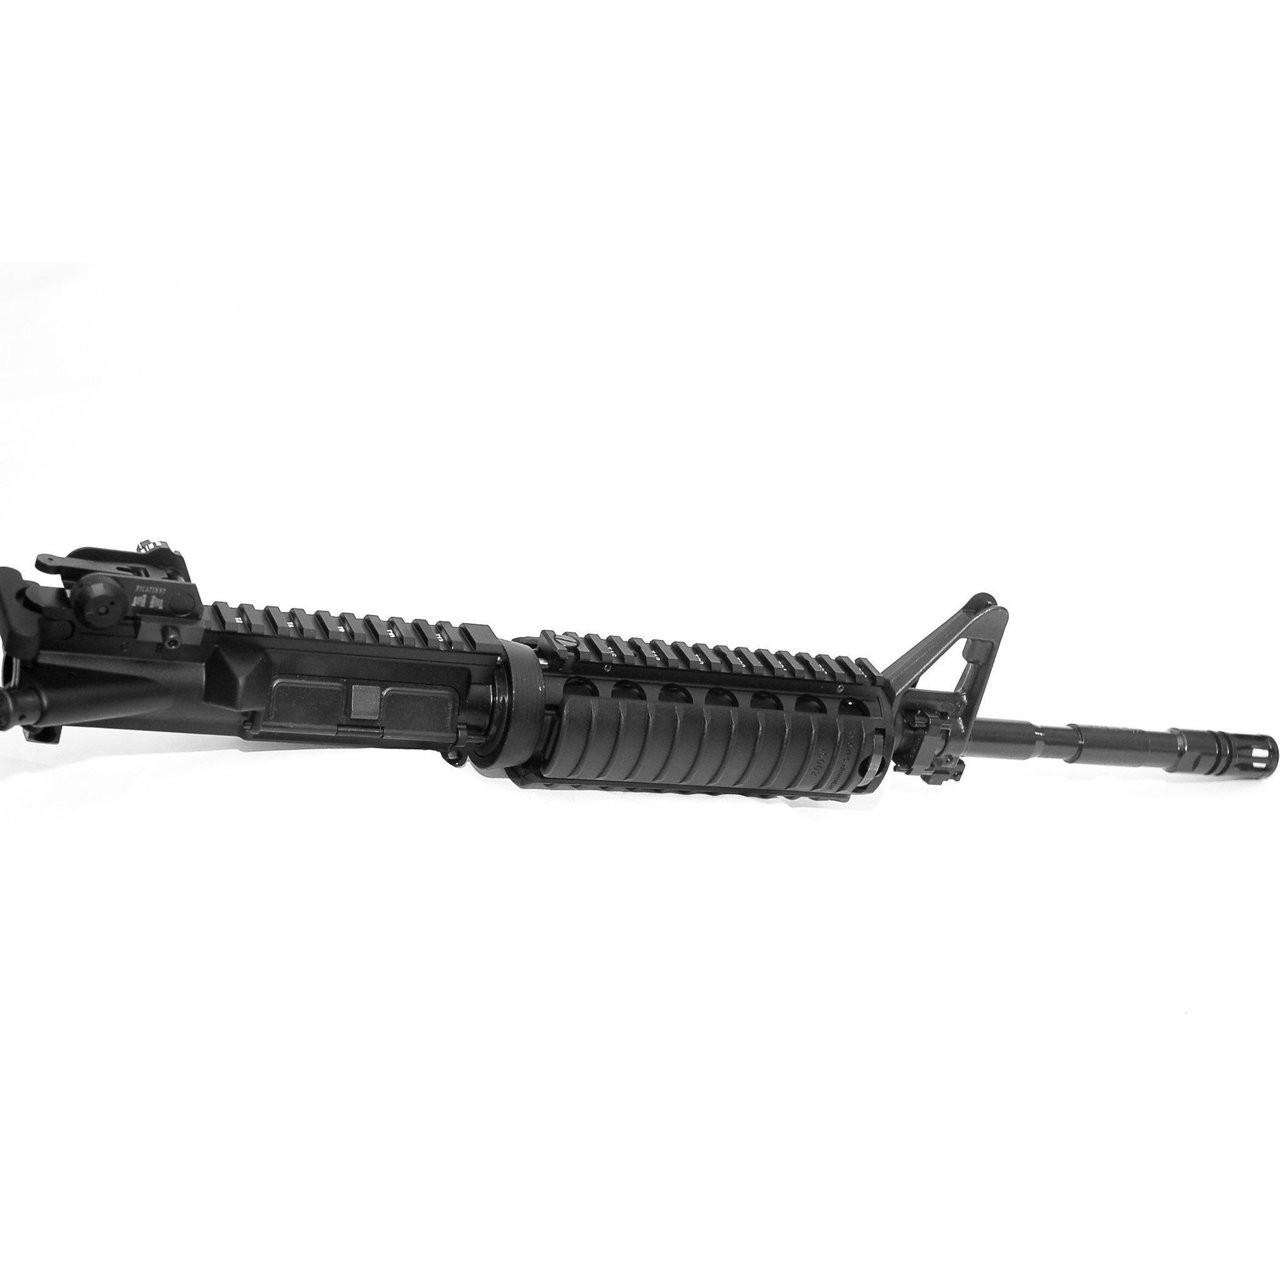 Colt M4A1 factory upper receiver group, complete 2017 (non-SBR)